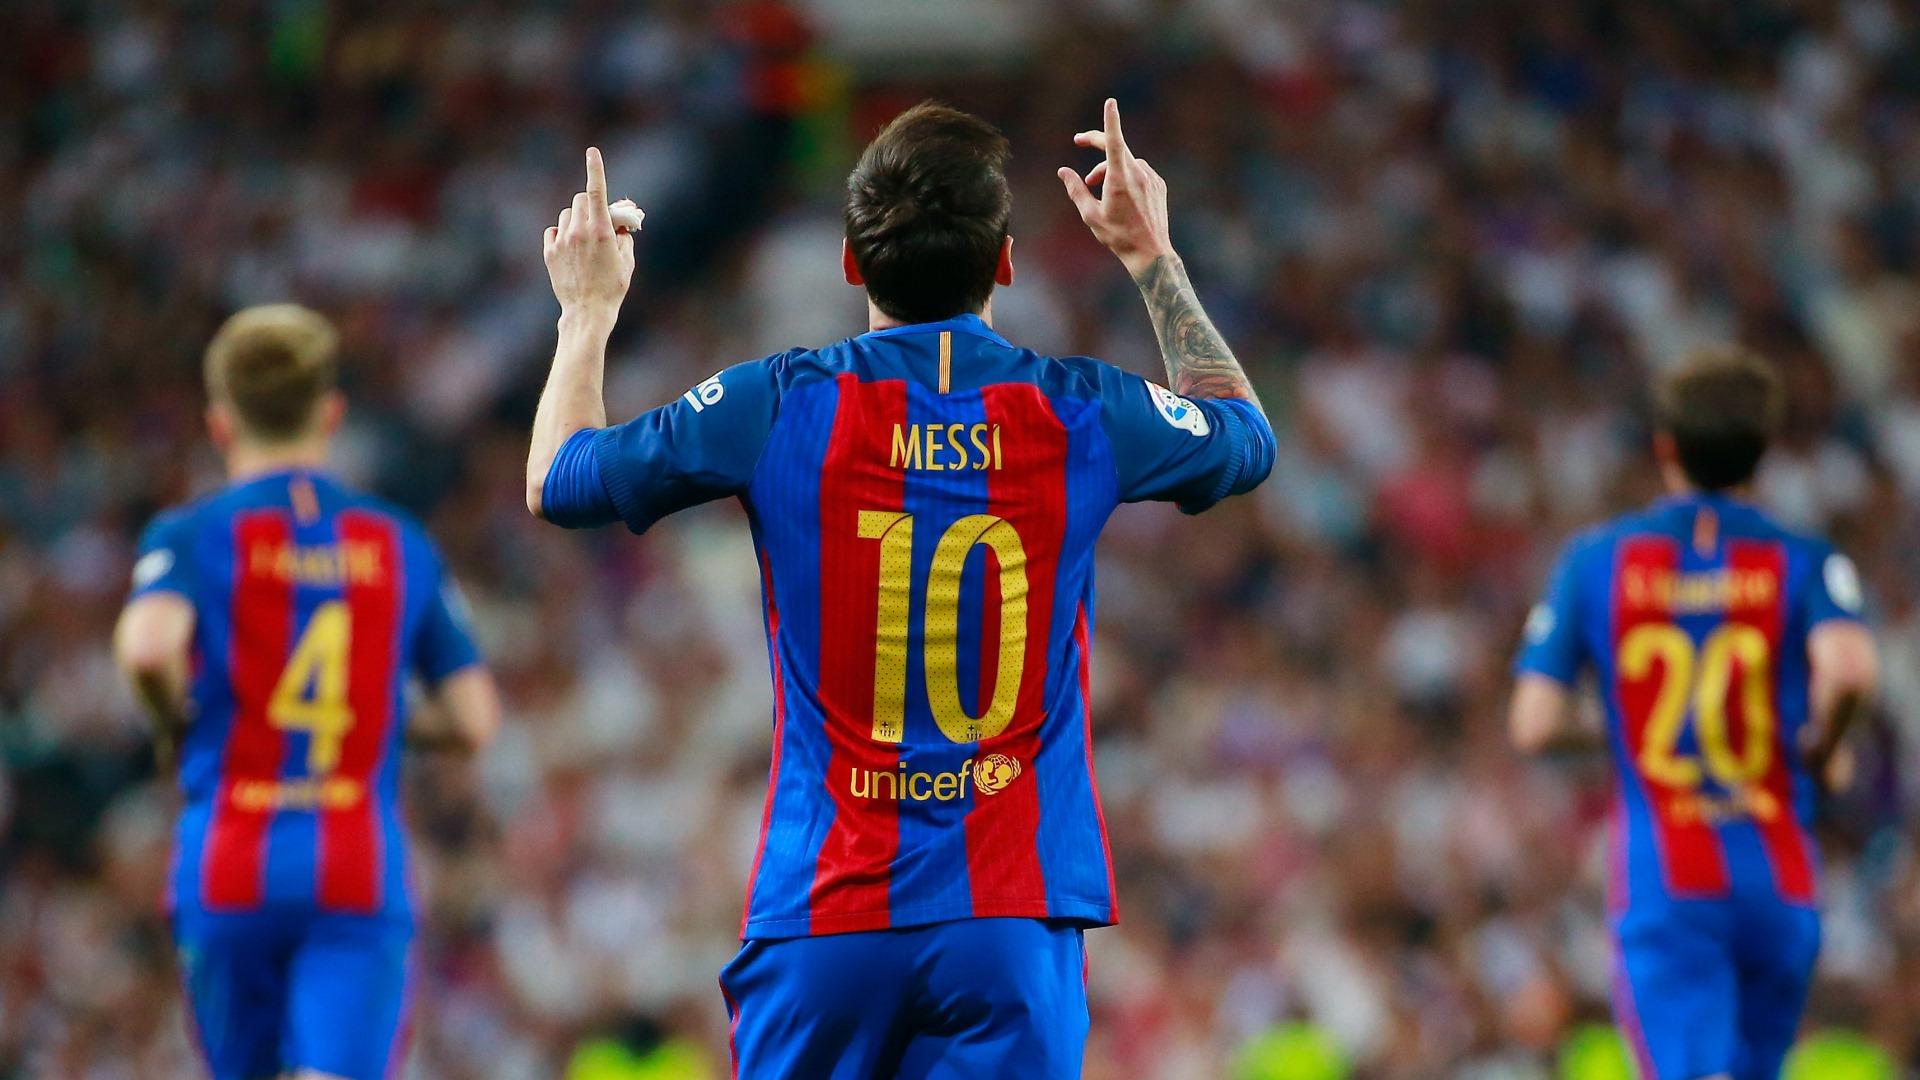 Lionel Messi Real Madrid Barcelona LaLiga 23042017 - Goal.com